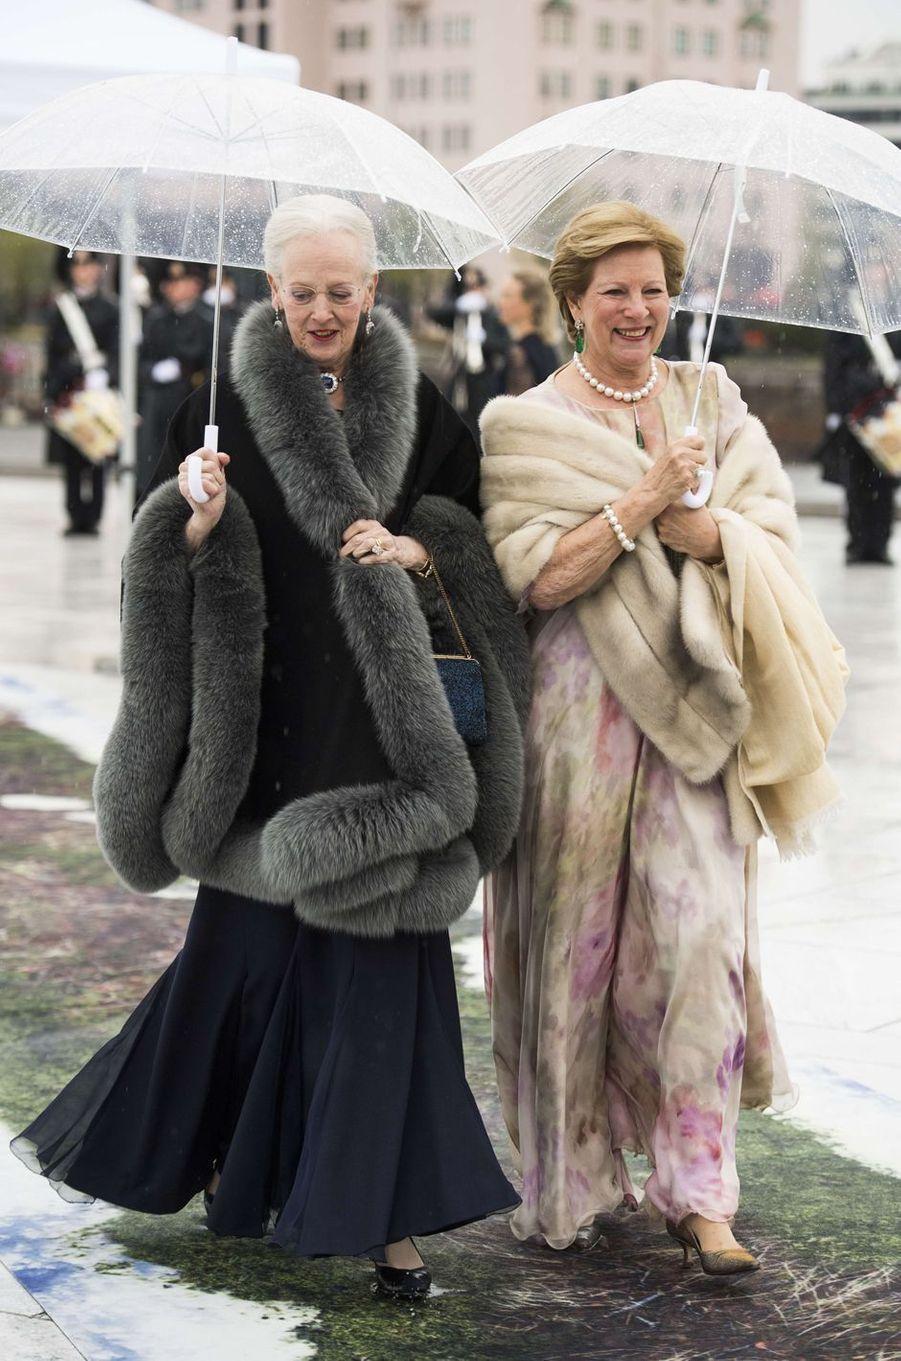 La reine Margrethe II de Danemark et l'ex-reine Anne-Marie de Grèce à Oslo le 10 mai 2017